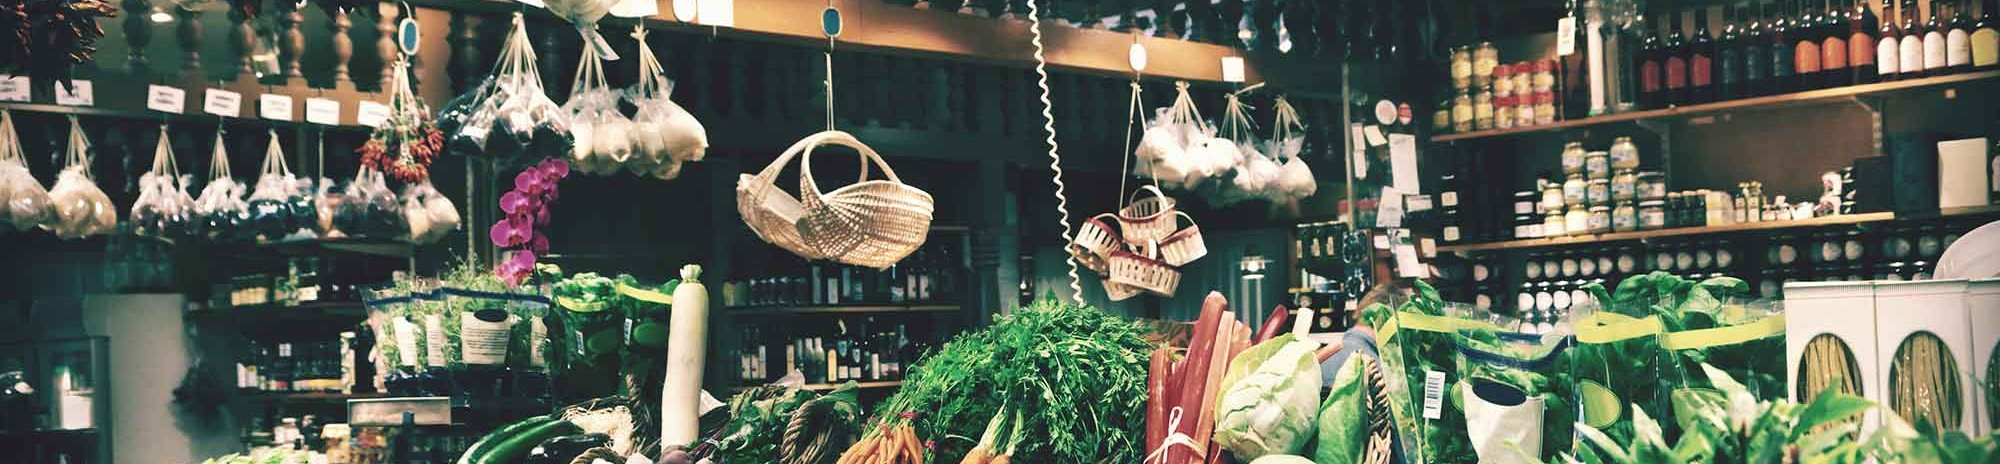 walton-stores-food-toowoomba